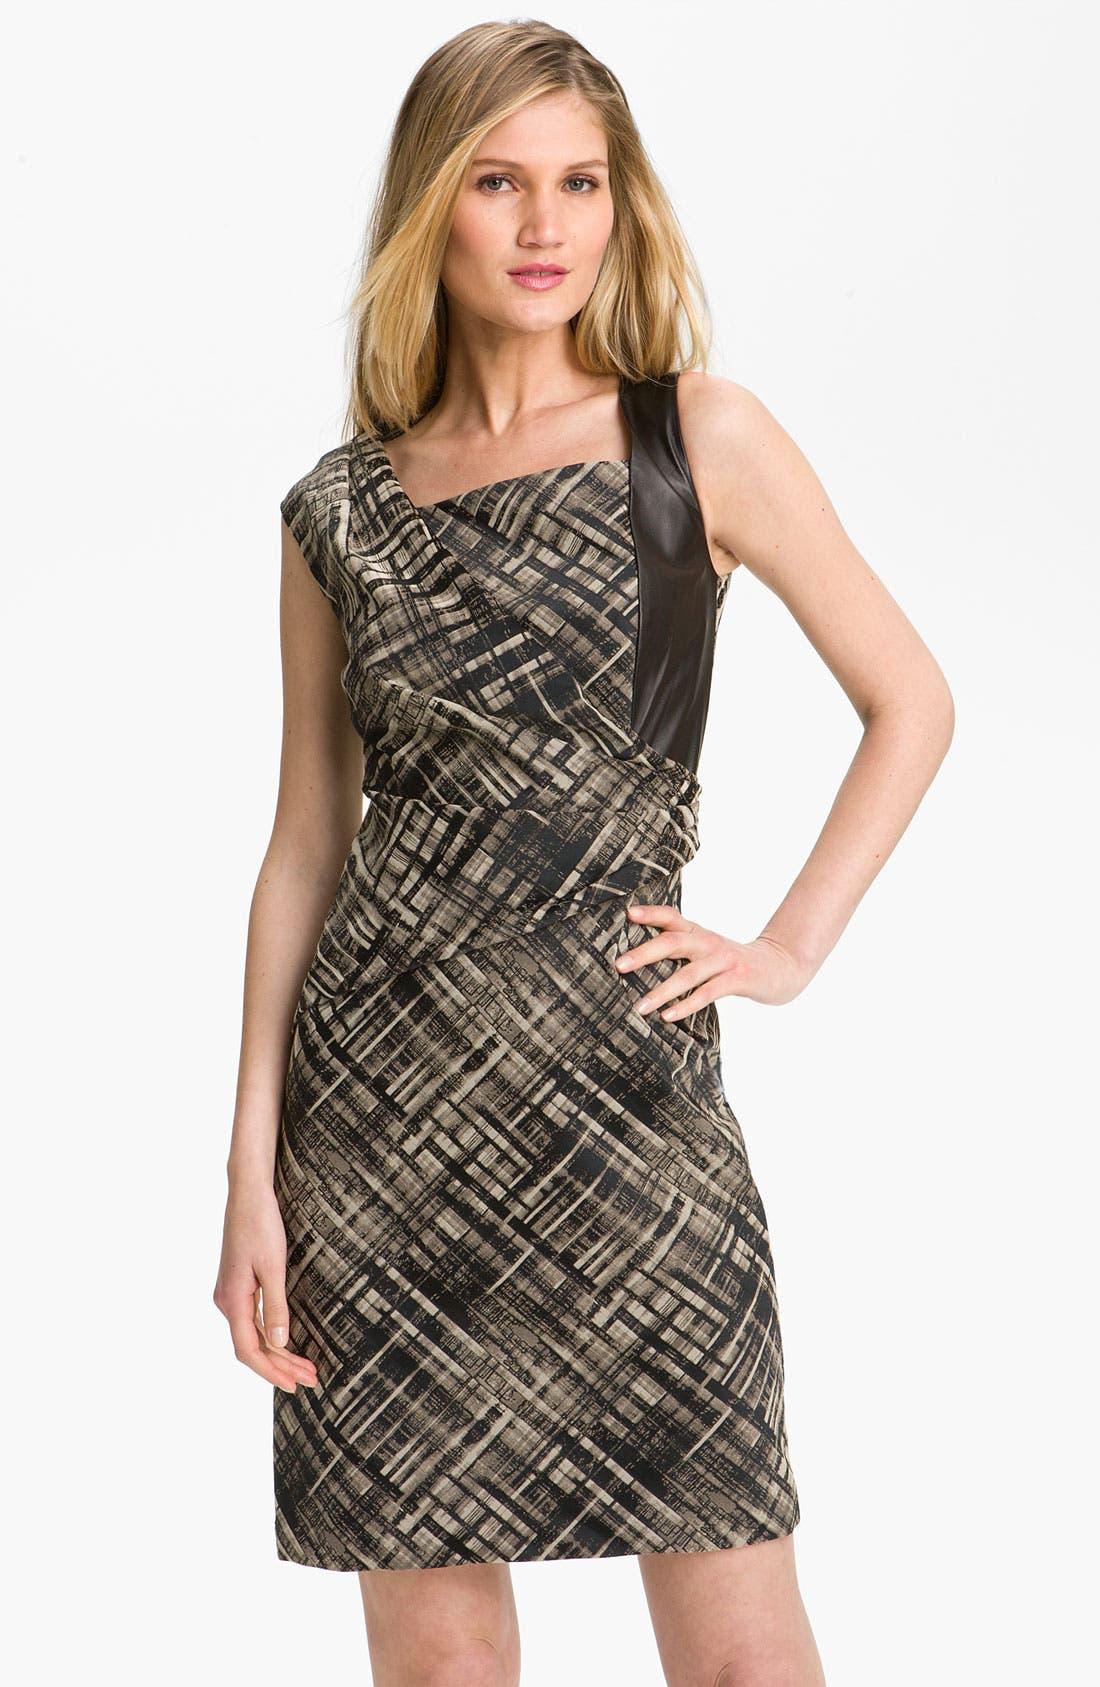 Alternate Image 1 Selected - Lafayette 148 New York 'Vania Magna Jacquard' Sheath Dress